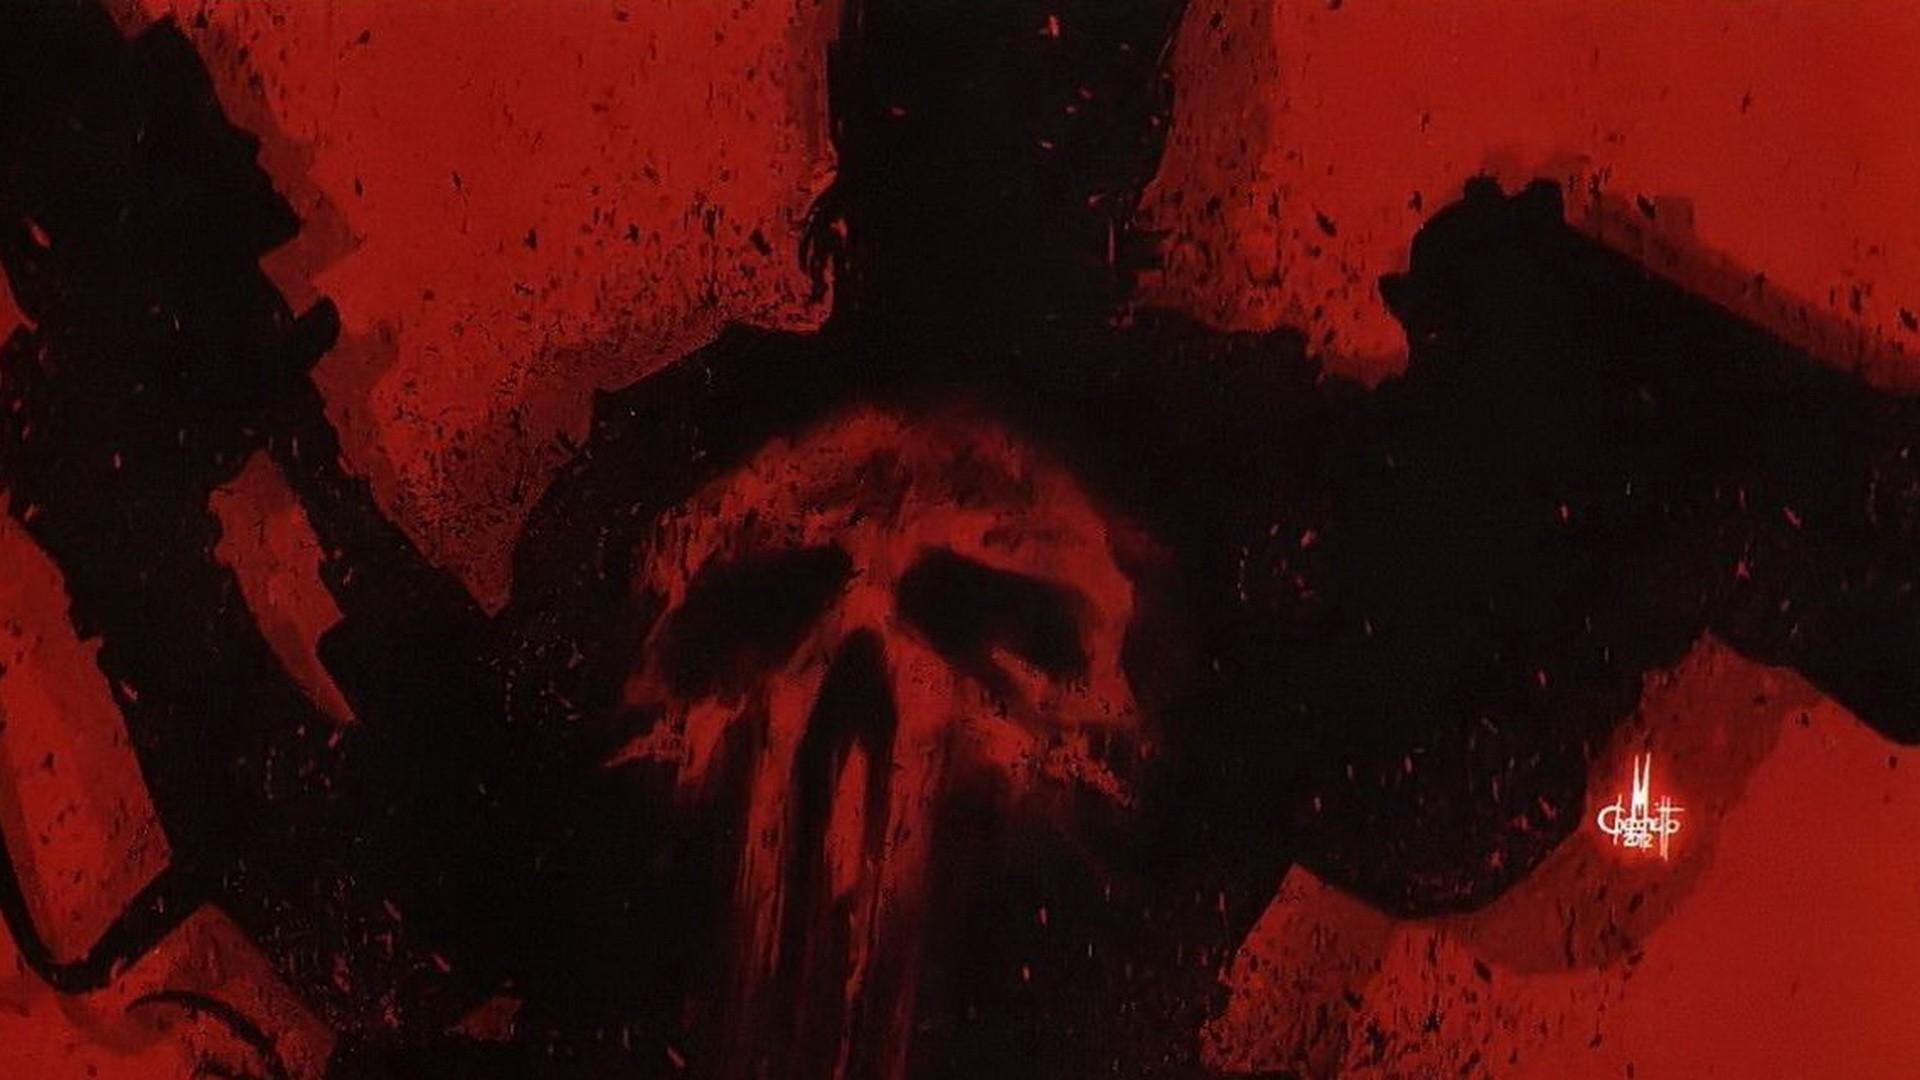 Punisher Skull Wallpaper – images & pictures